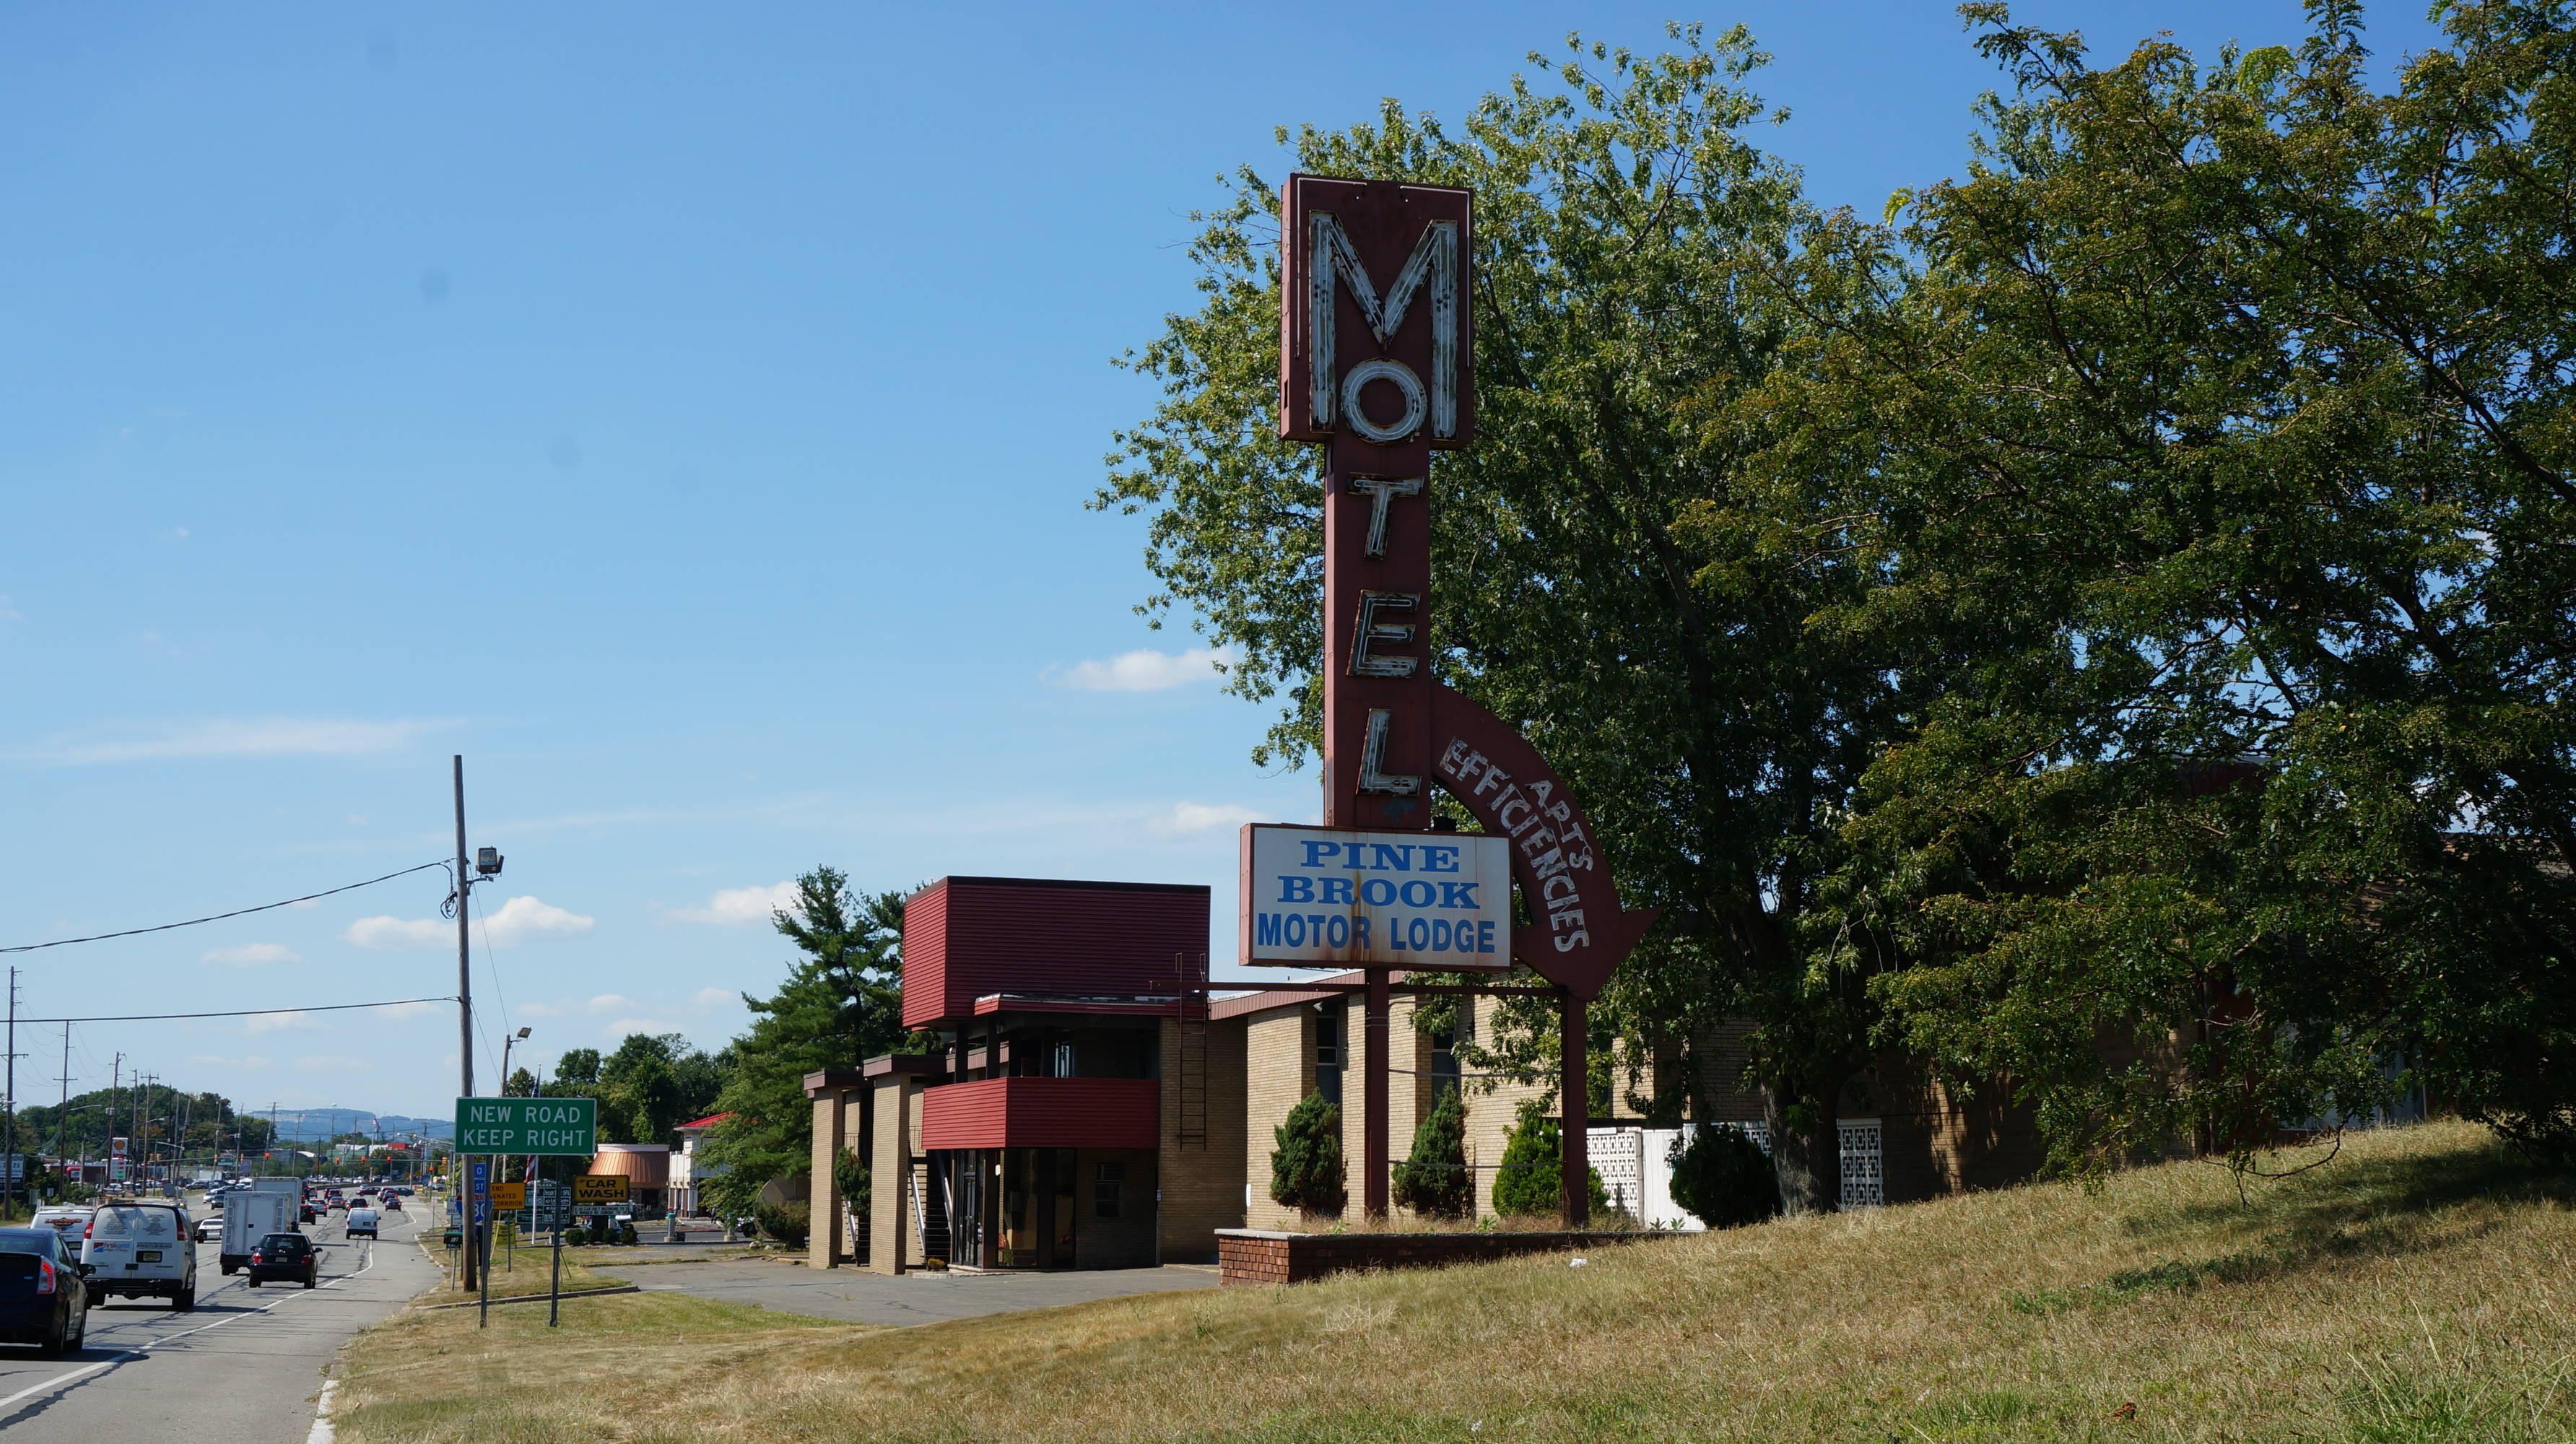 Motor Lodge Motel Union Nj